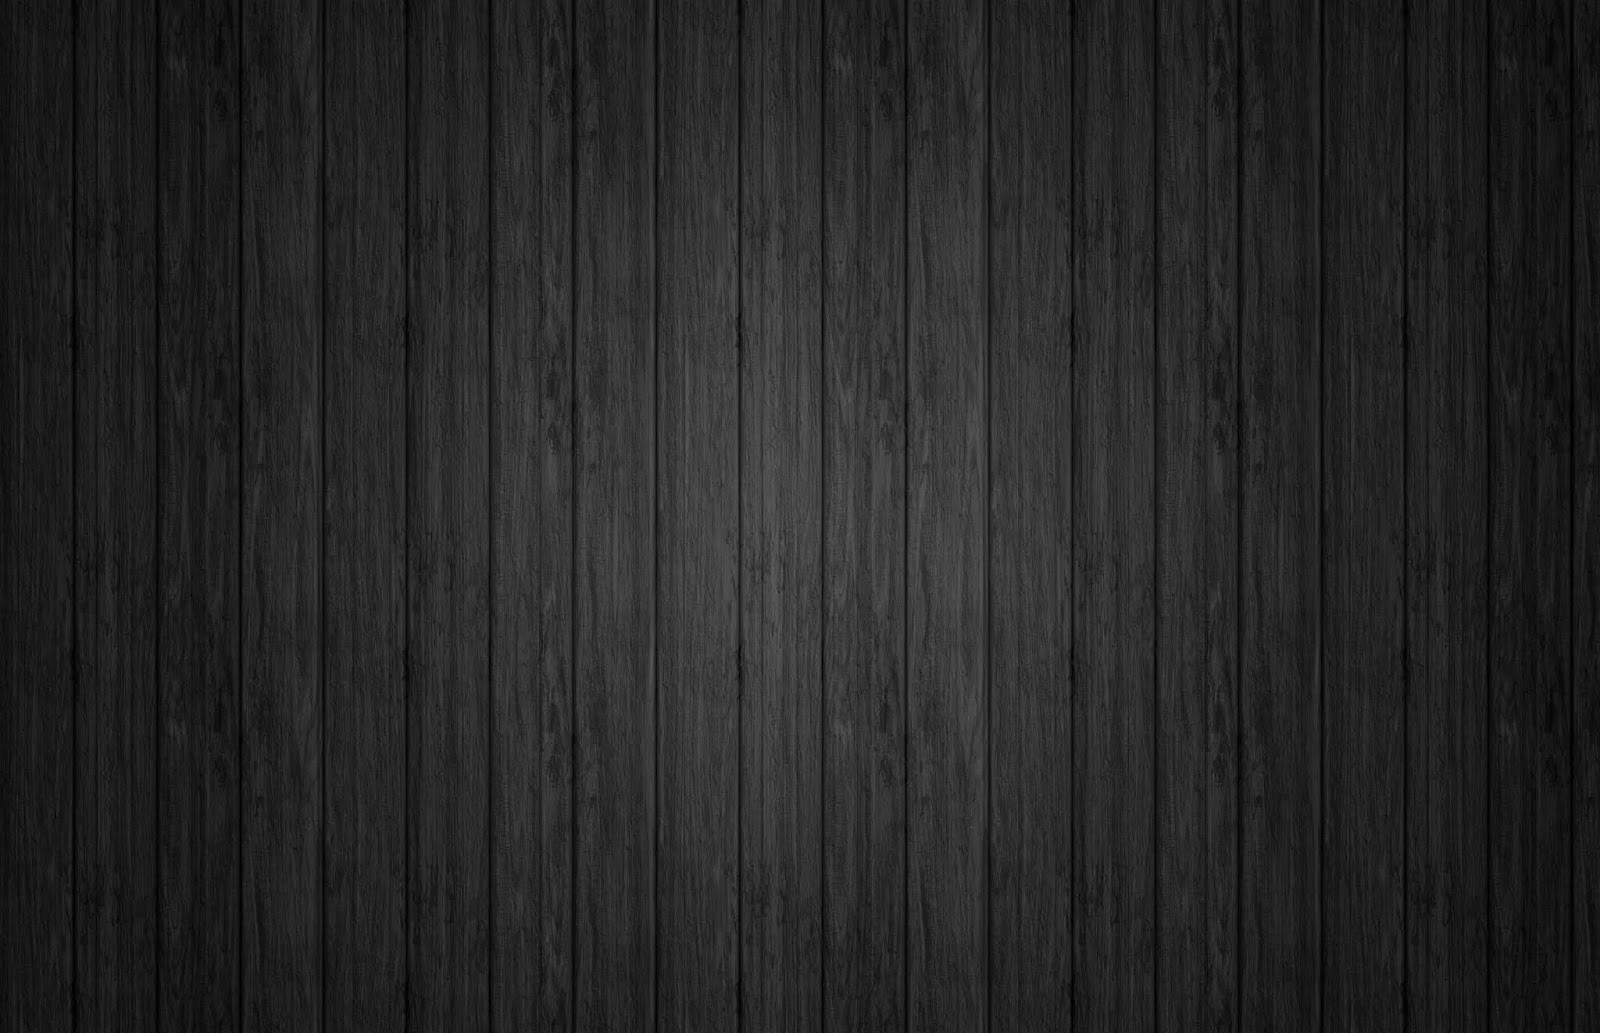 Plain Website Backgrounds Background Editing Picsart